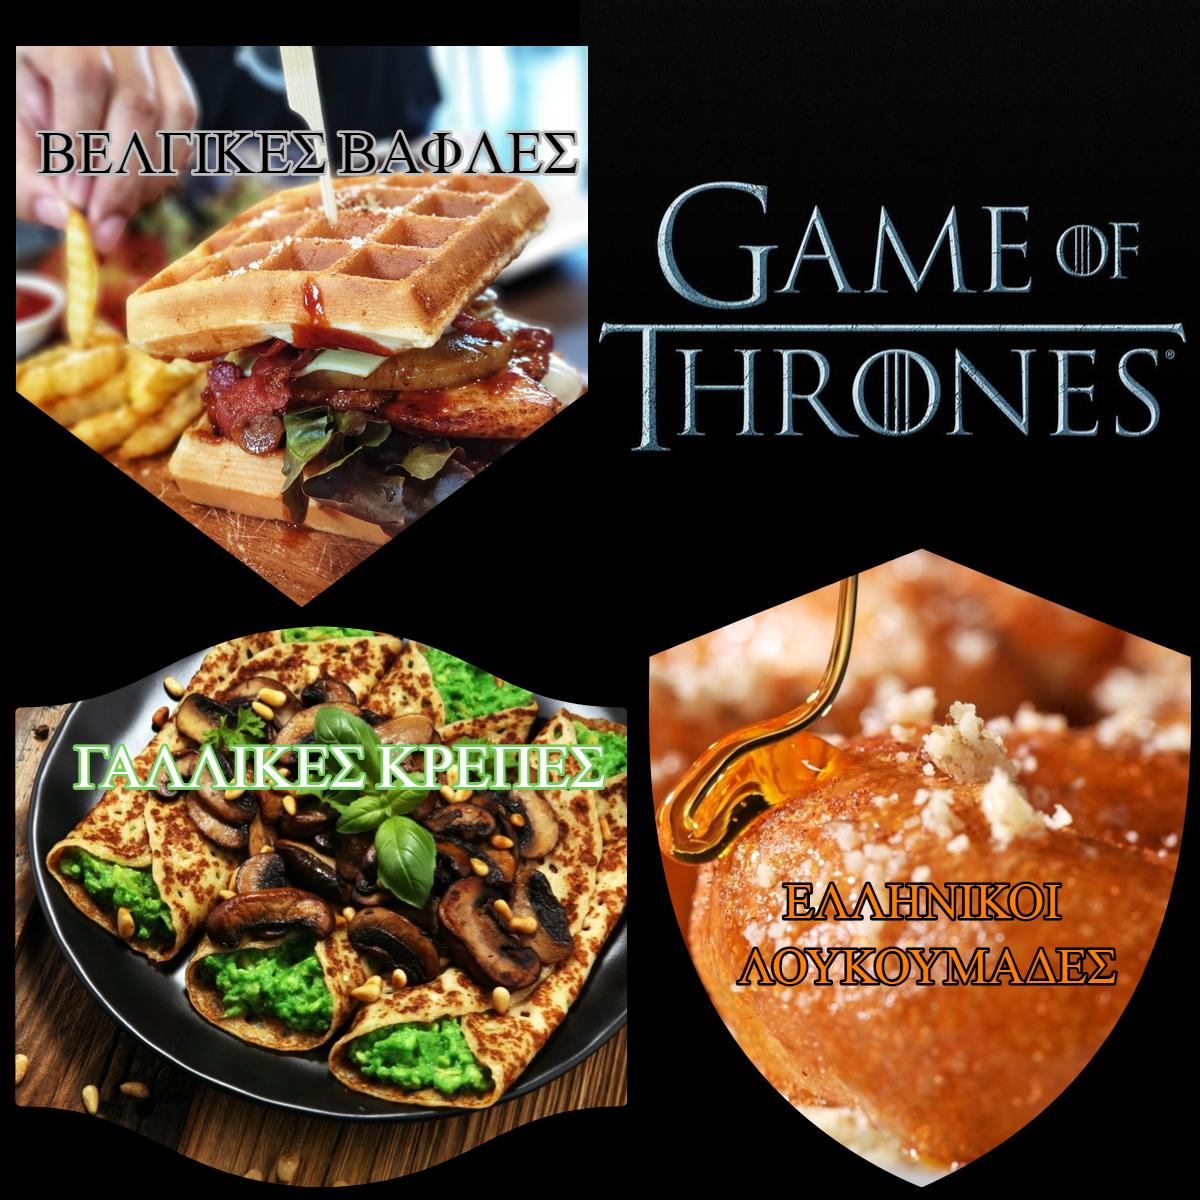 GAME OF THRONES - ΤΜΗΜΑ: ΕΛΛΗΝΙΚΟΙ ΛΟΥΚΟΥΜΑΔΕΣ